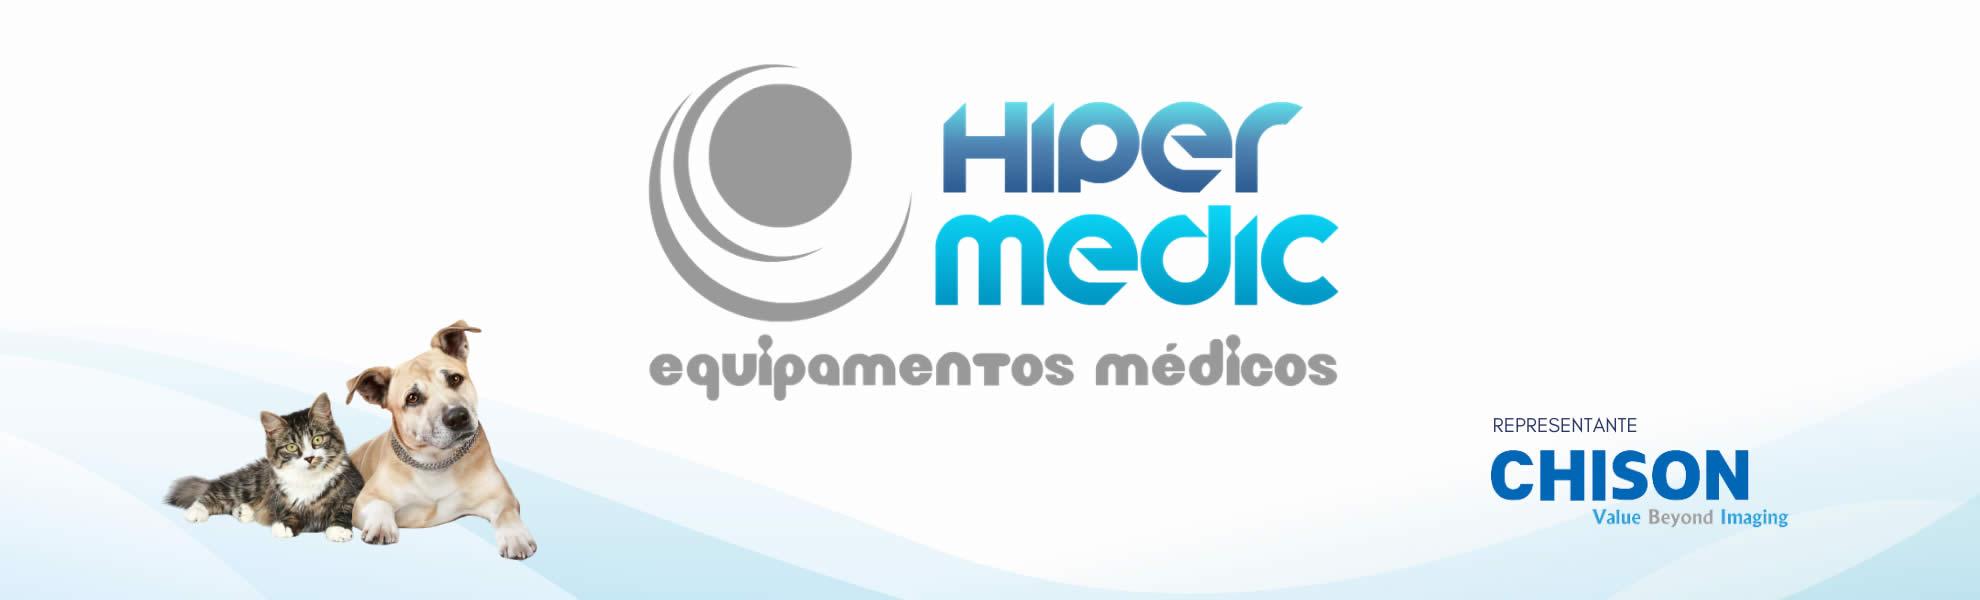 Hipermedic (2)